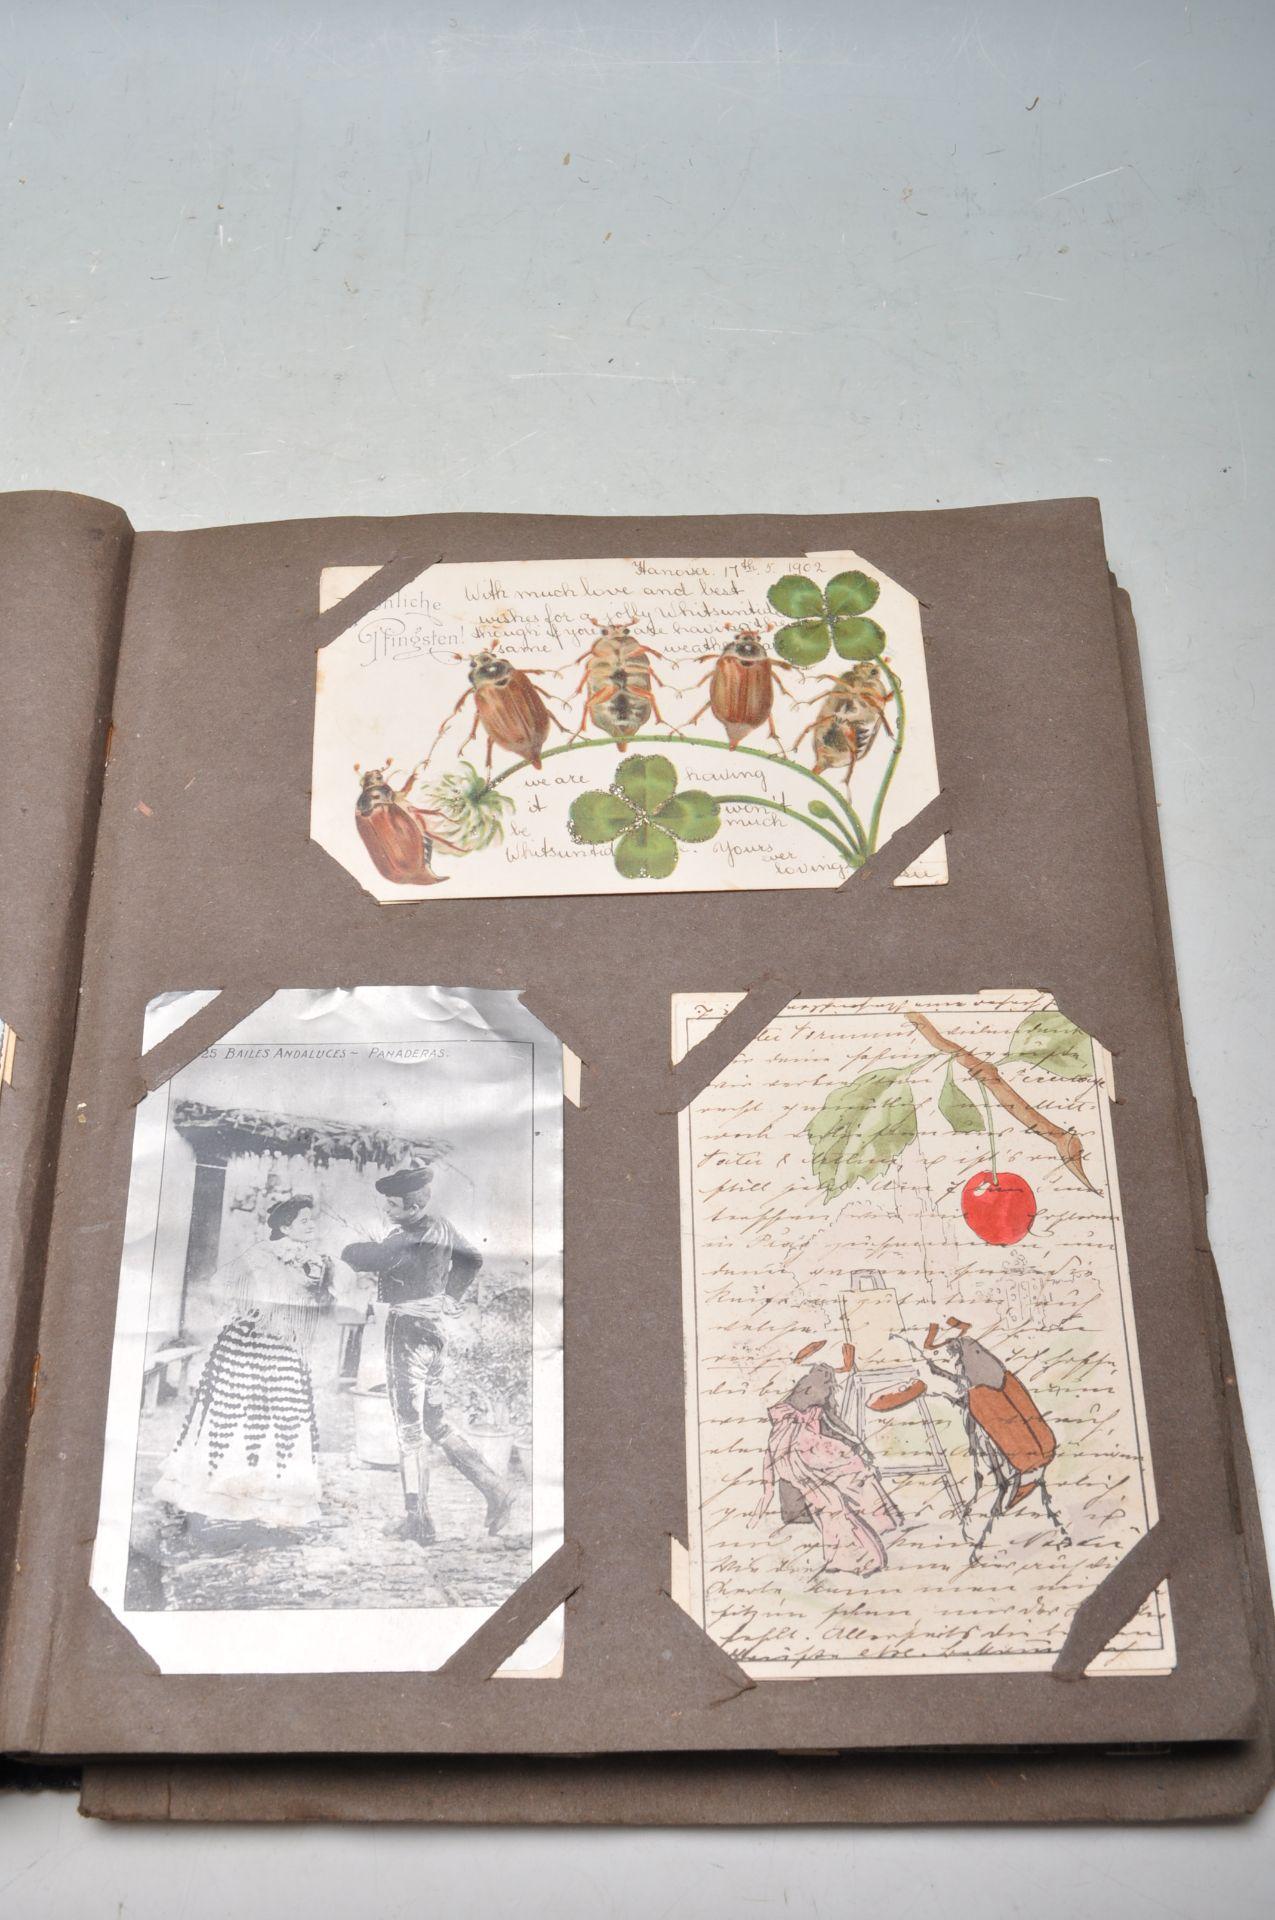 ALBUM OF FOREIGN POSTCARDS - ALL CIRCA WW1 PERIOD - Bild 9 aus 23